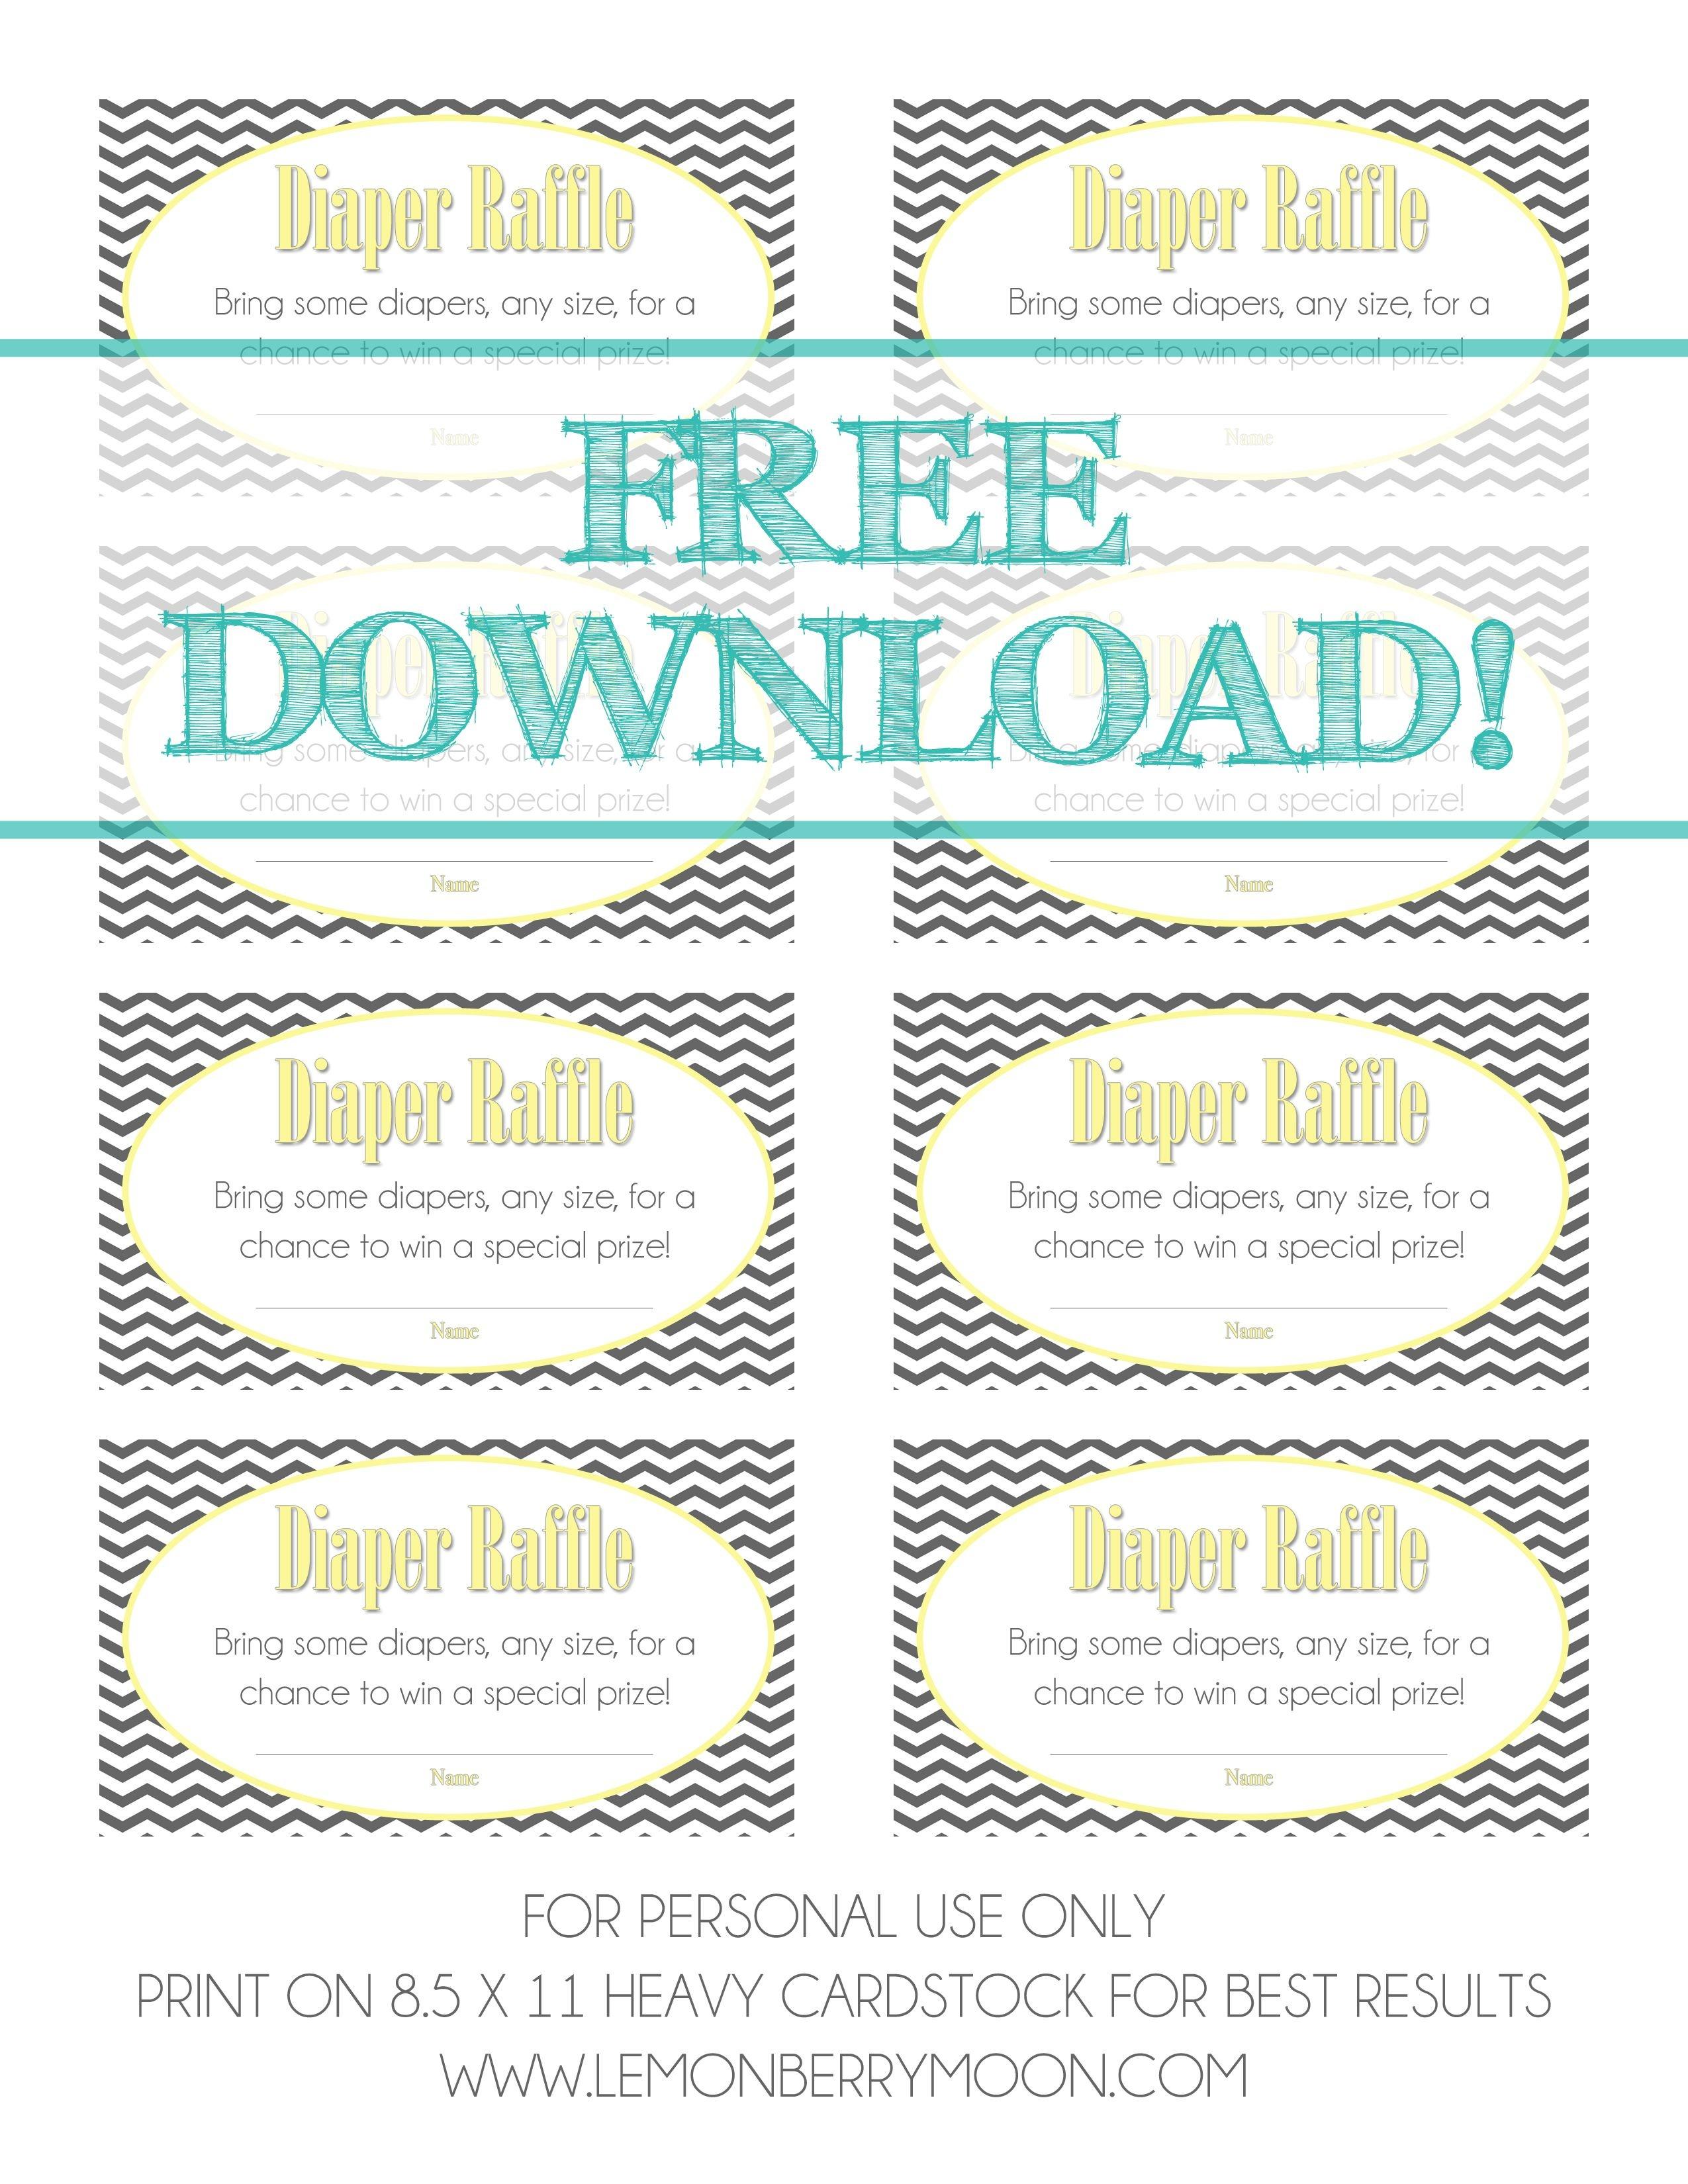 Free Download - Baby Diaper Raffle Template   Baaby Shower   Baby - Diaper Raffle Template Free Printable